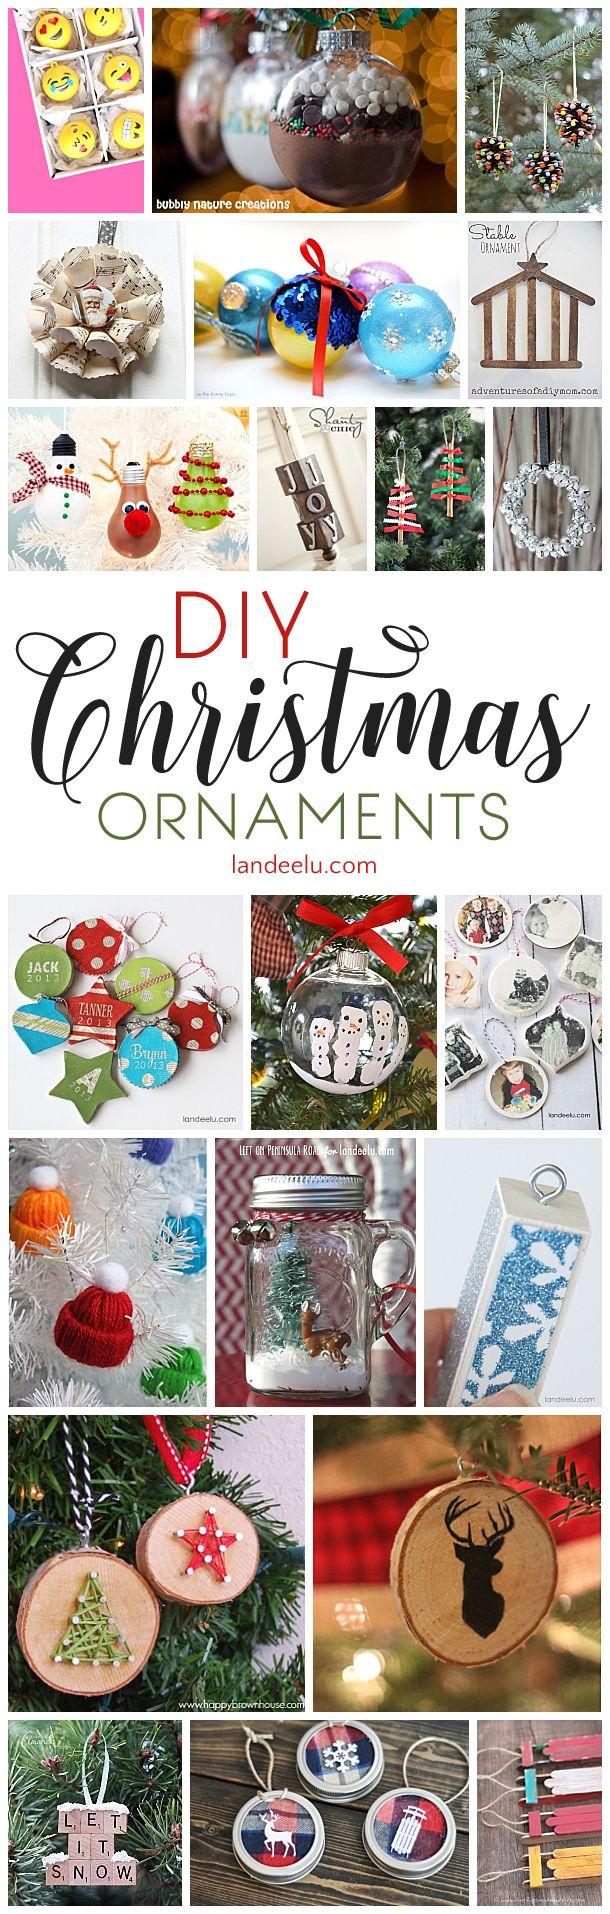 485 best ho ho ho images on pinterest christmas ideas christmas diy christmas ornaments to make for a festive do it yourself holiday cheap easy solutioingenieria Choice Image